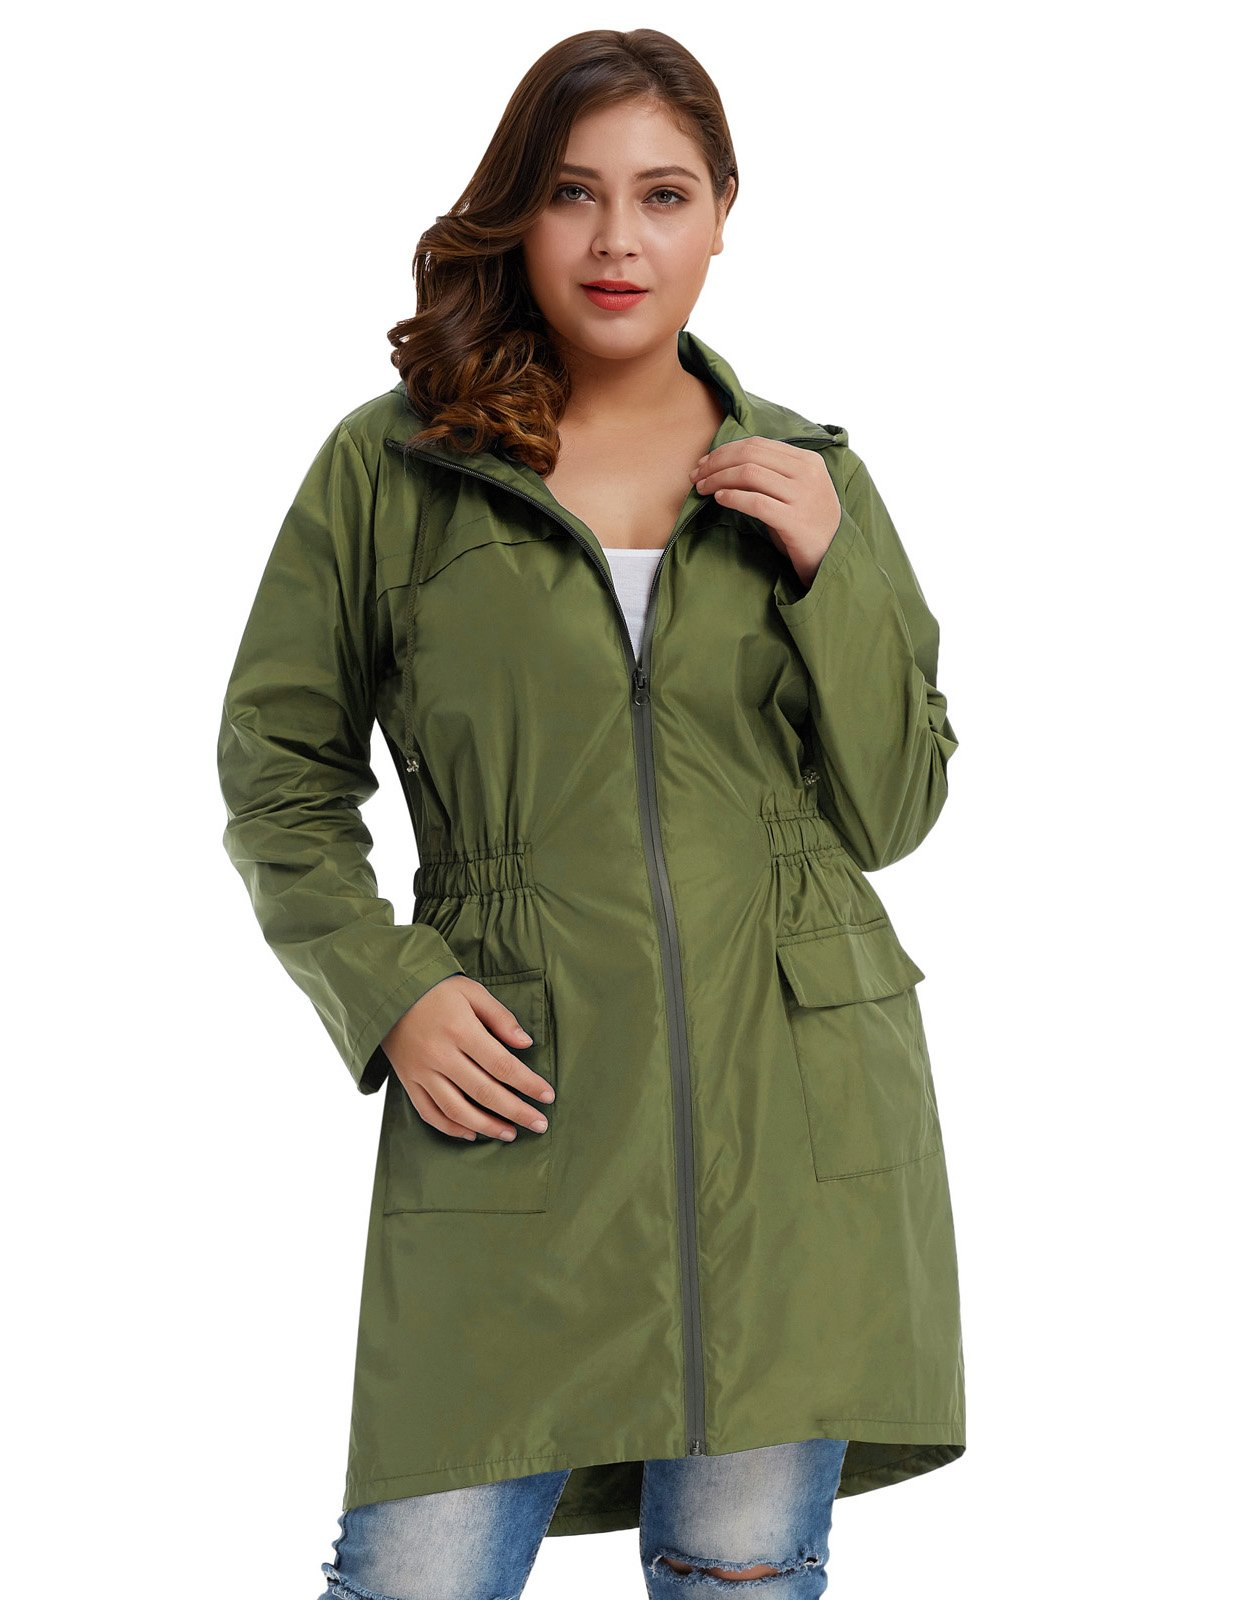 Hanna Nikole Women's Plus Size Lightweight Raincoat Travel Hoodie Rain Jacket